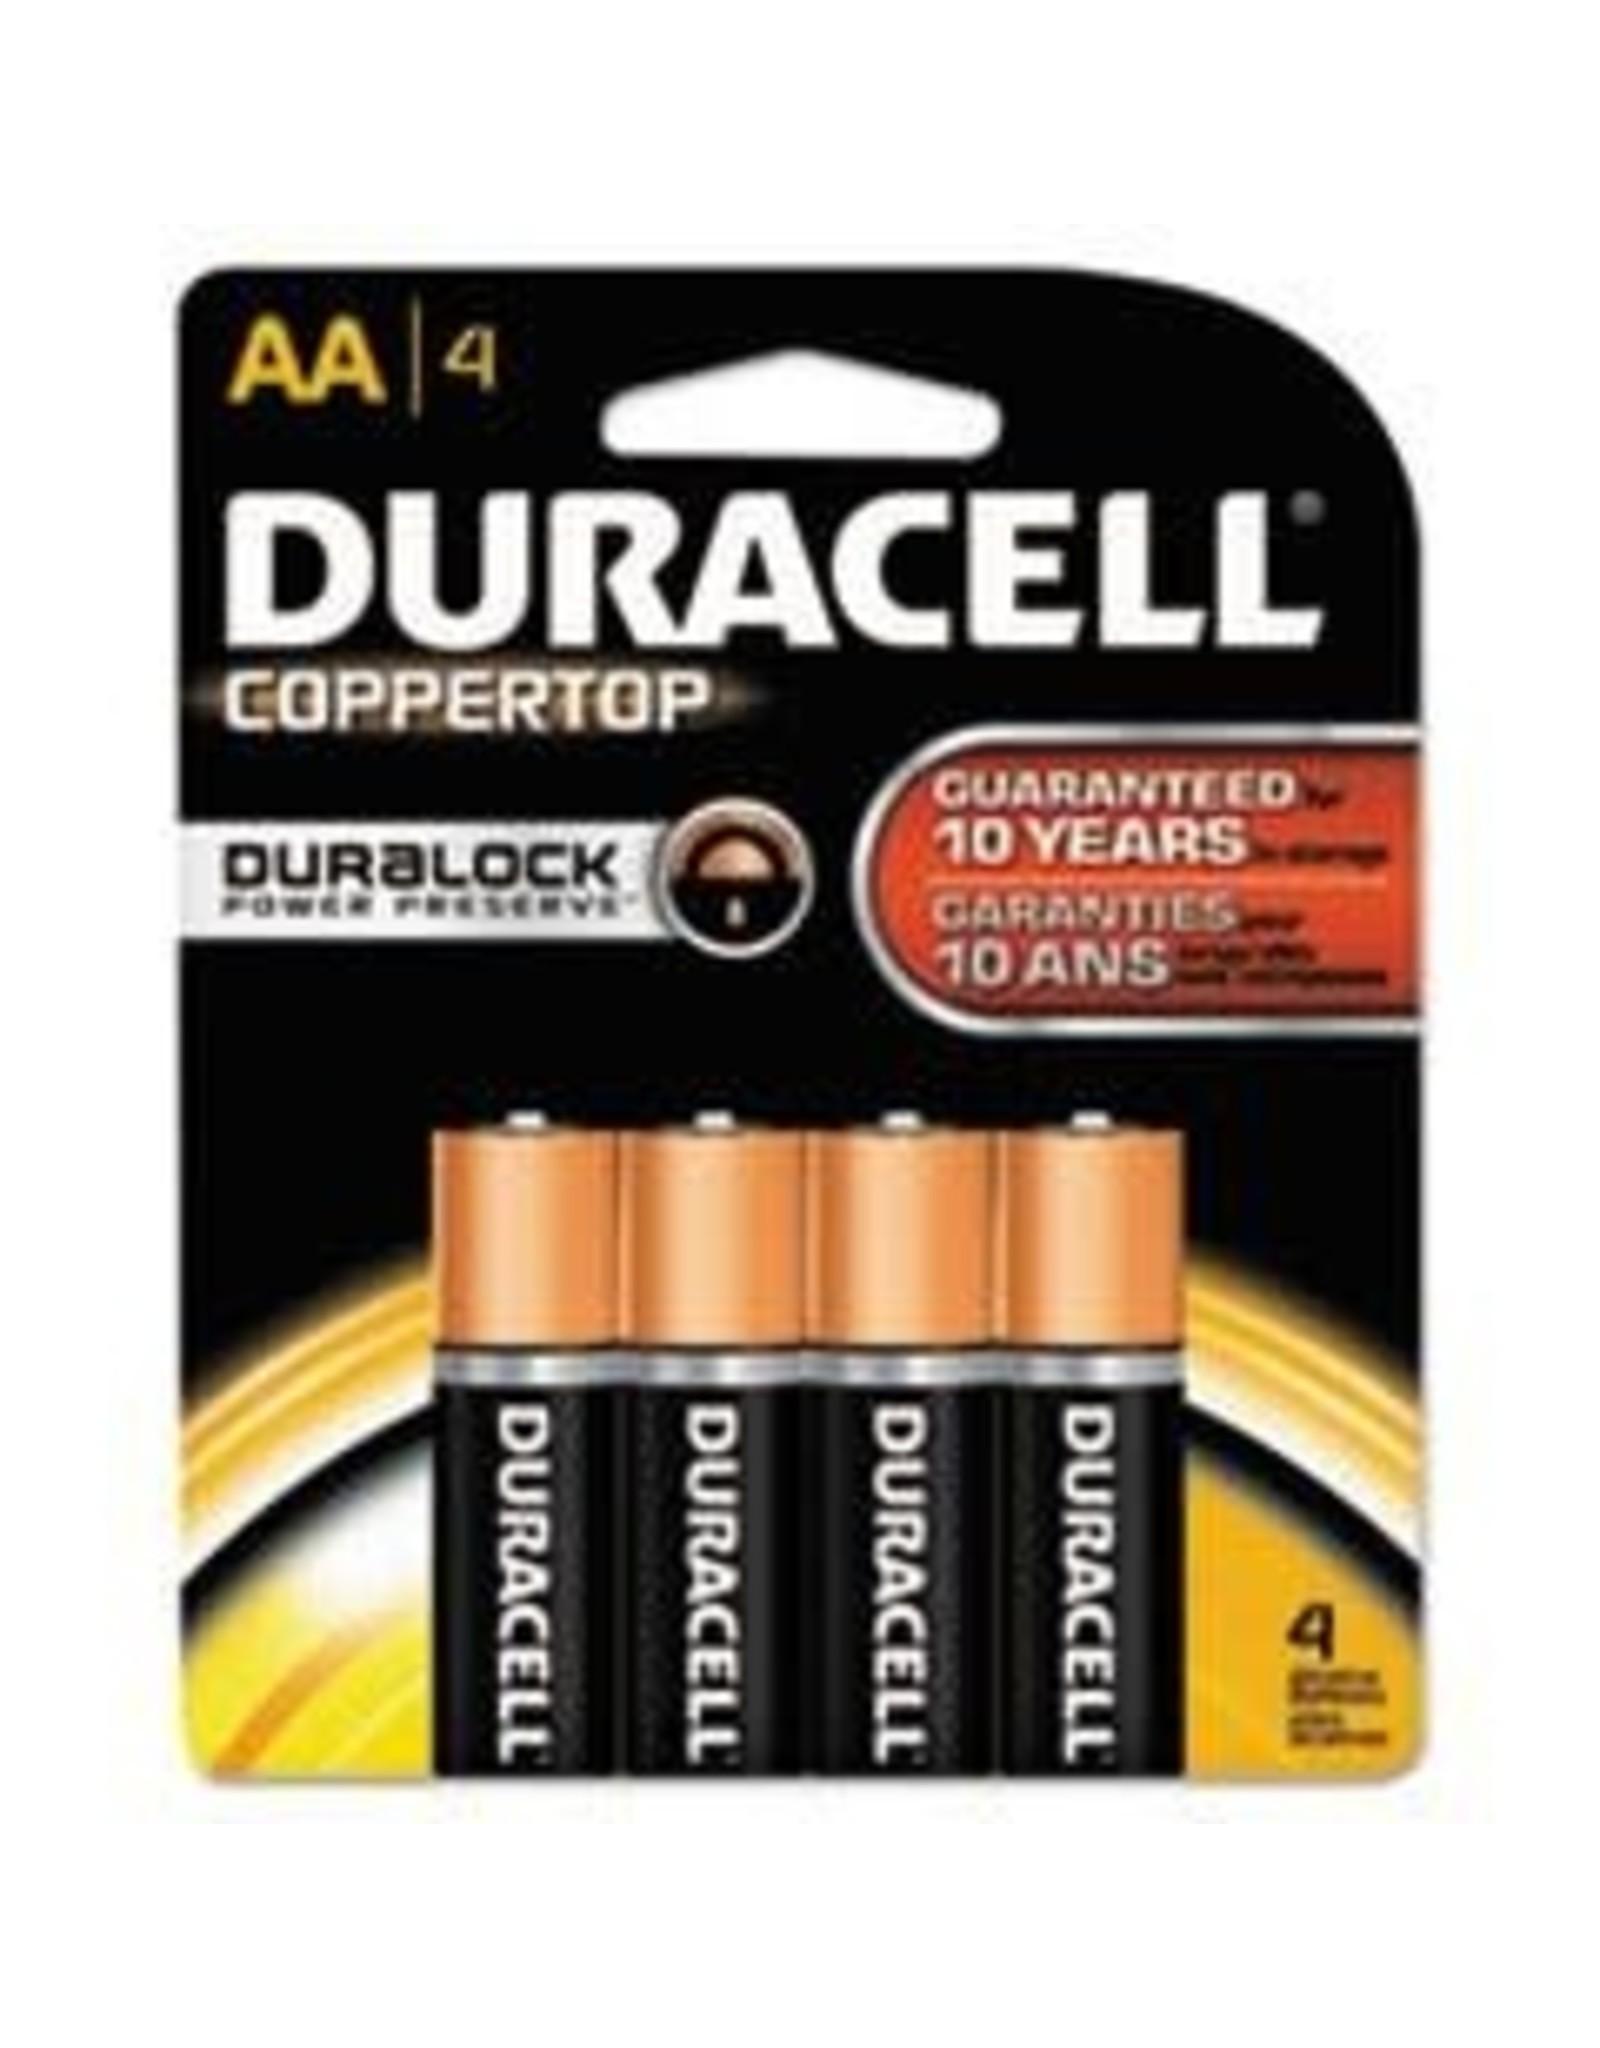 Duracell Duracell AA Coppertop Alkaline Batteries 4 Pack